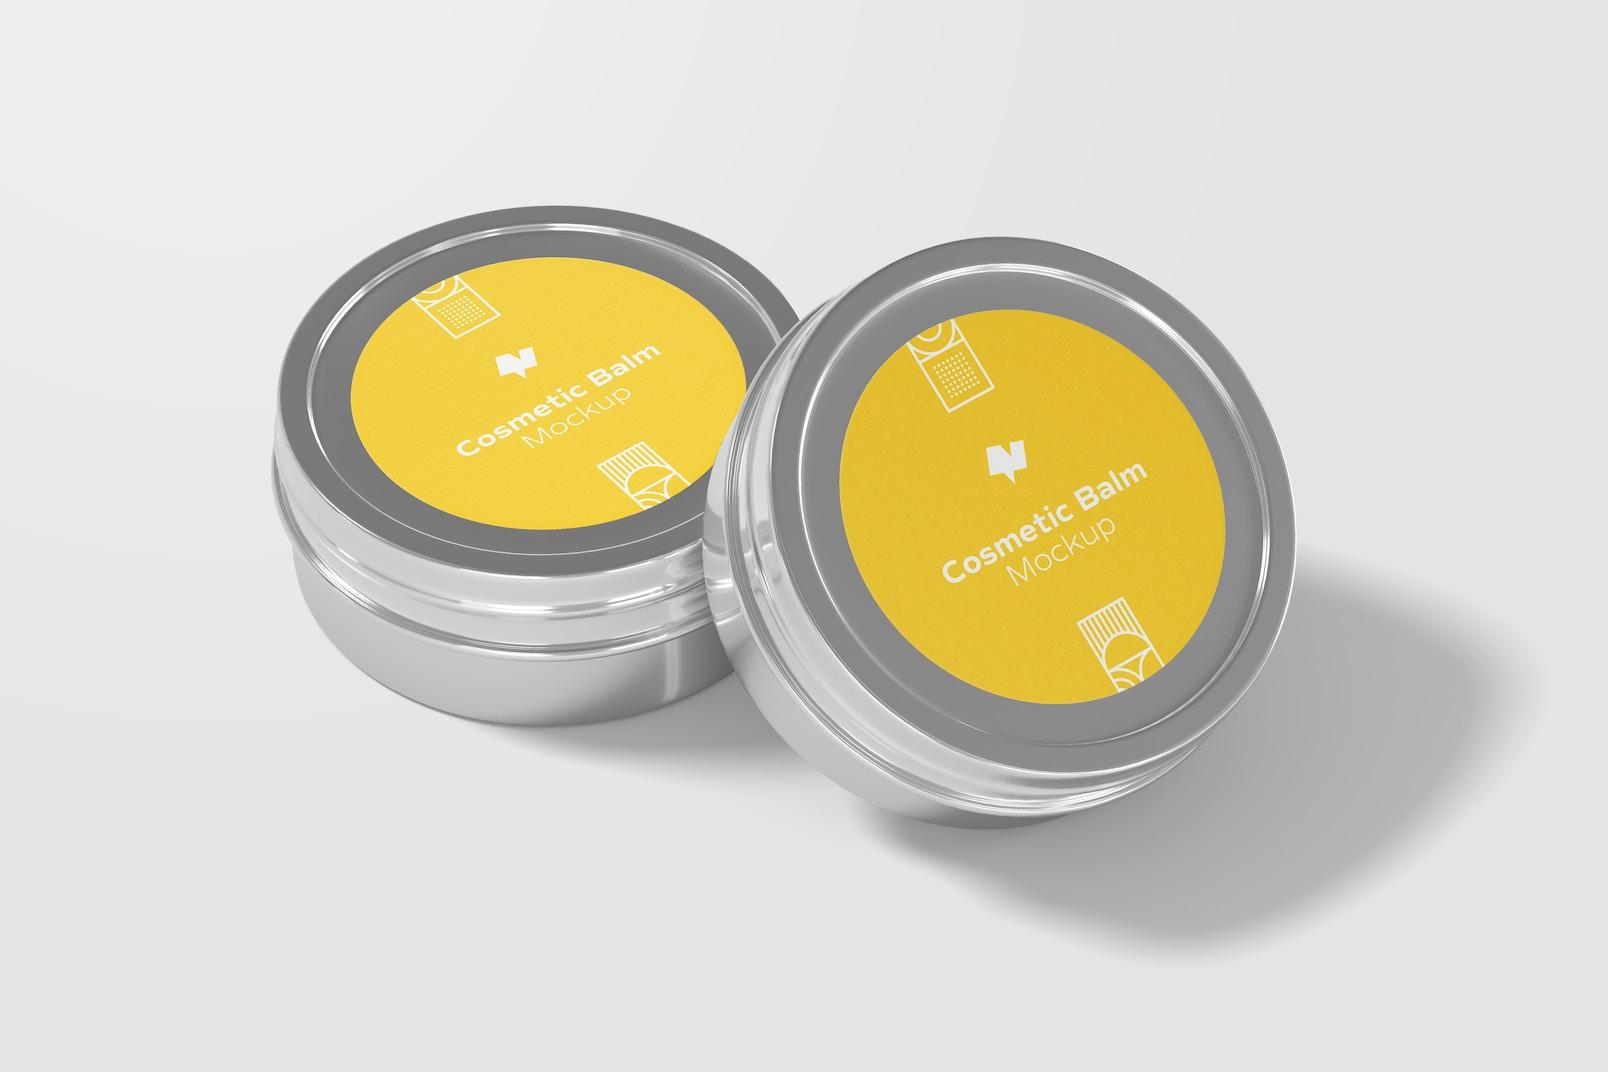 Metallic Cosmetic Balm Packaging Mockup, Closed